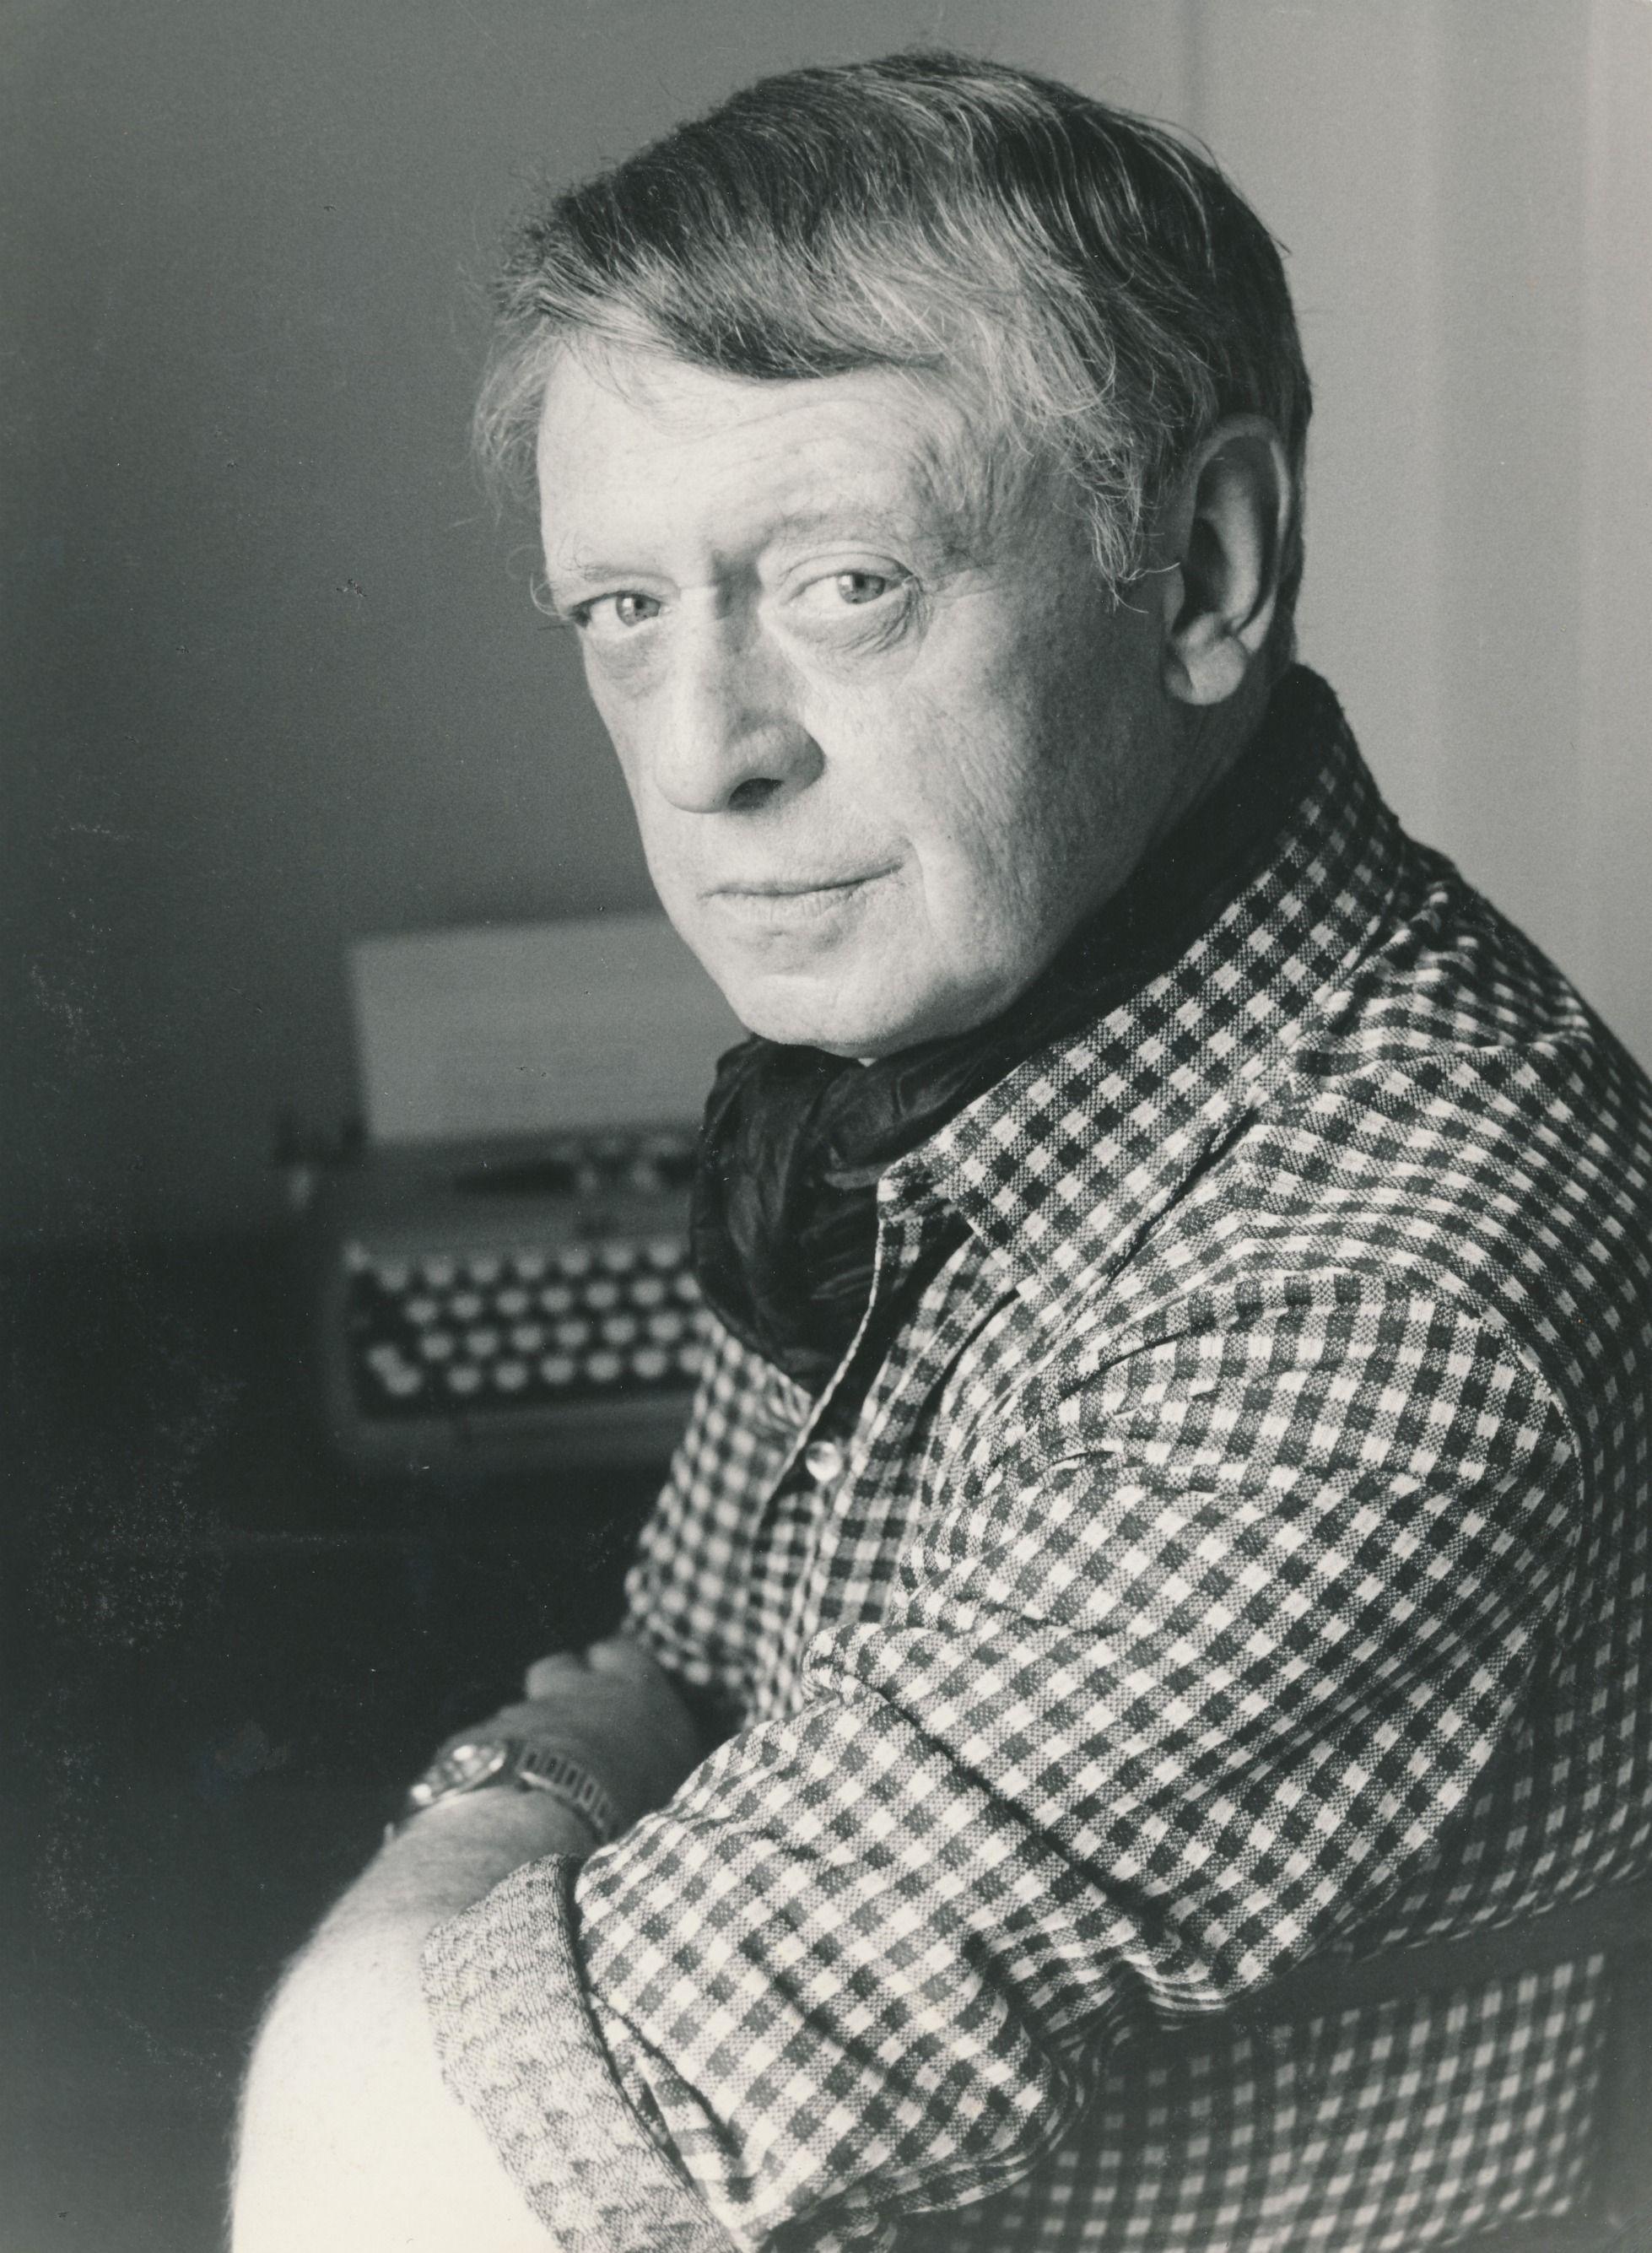 (Bromas fuera) ¿Qué terrible desgracia inspiró a Burgess para escribir la Naranja Mecánica?